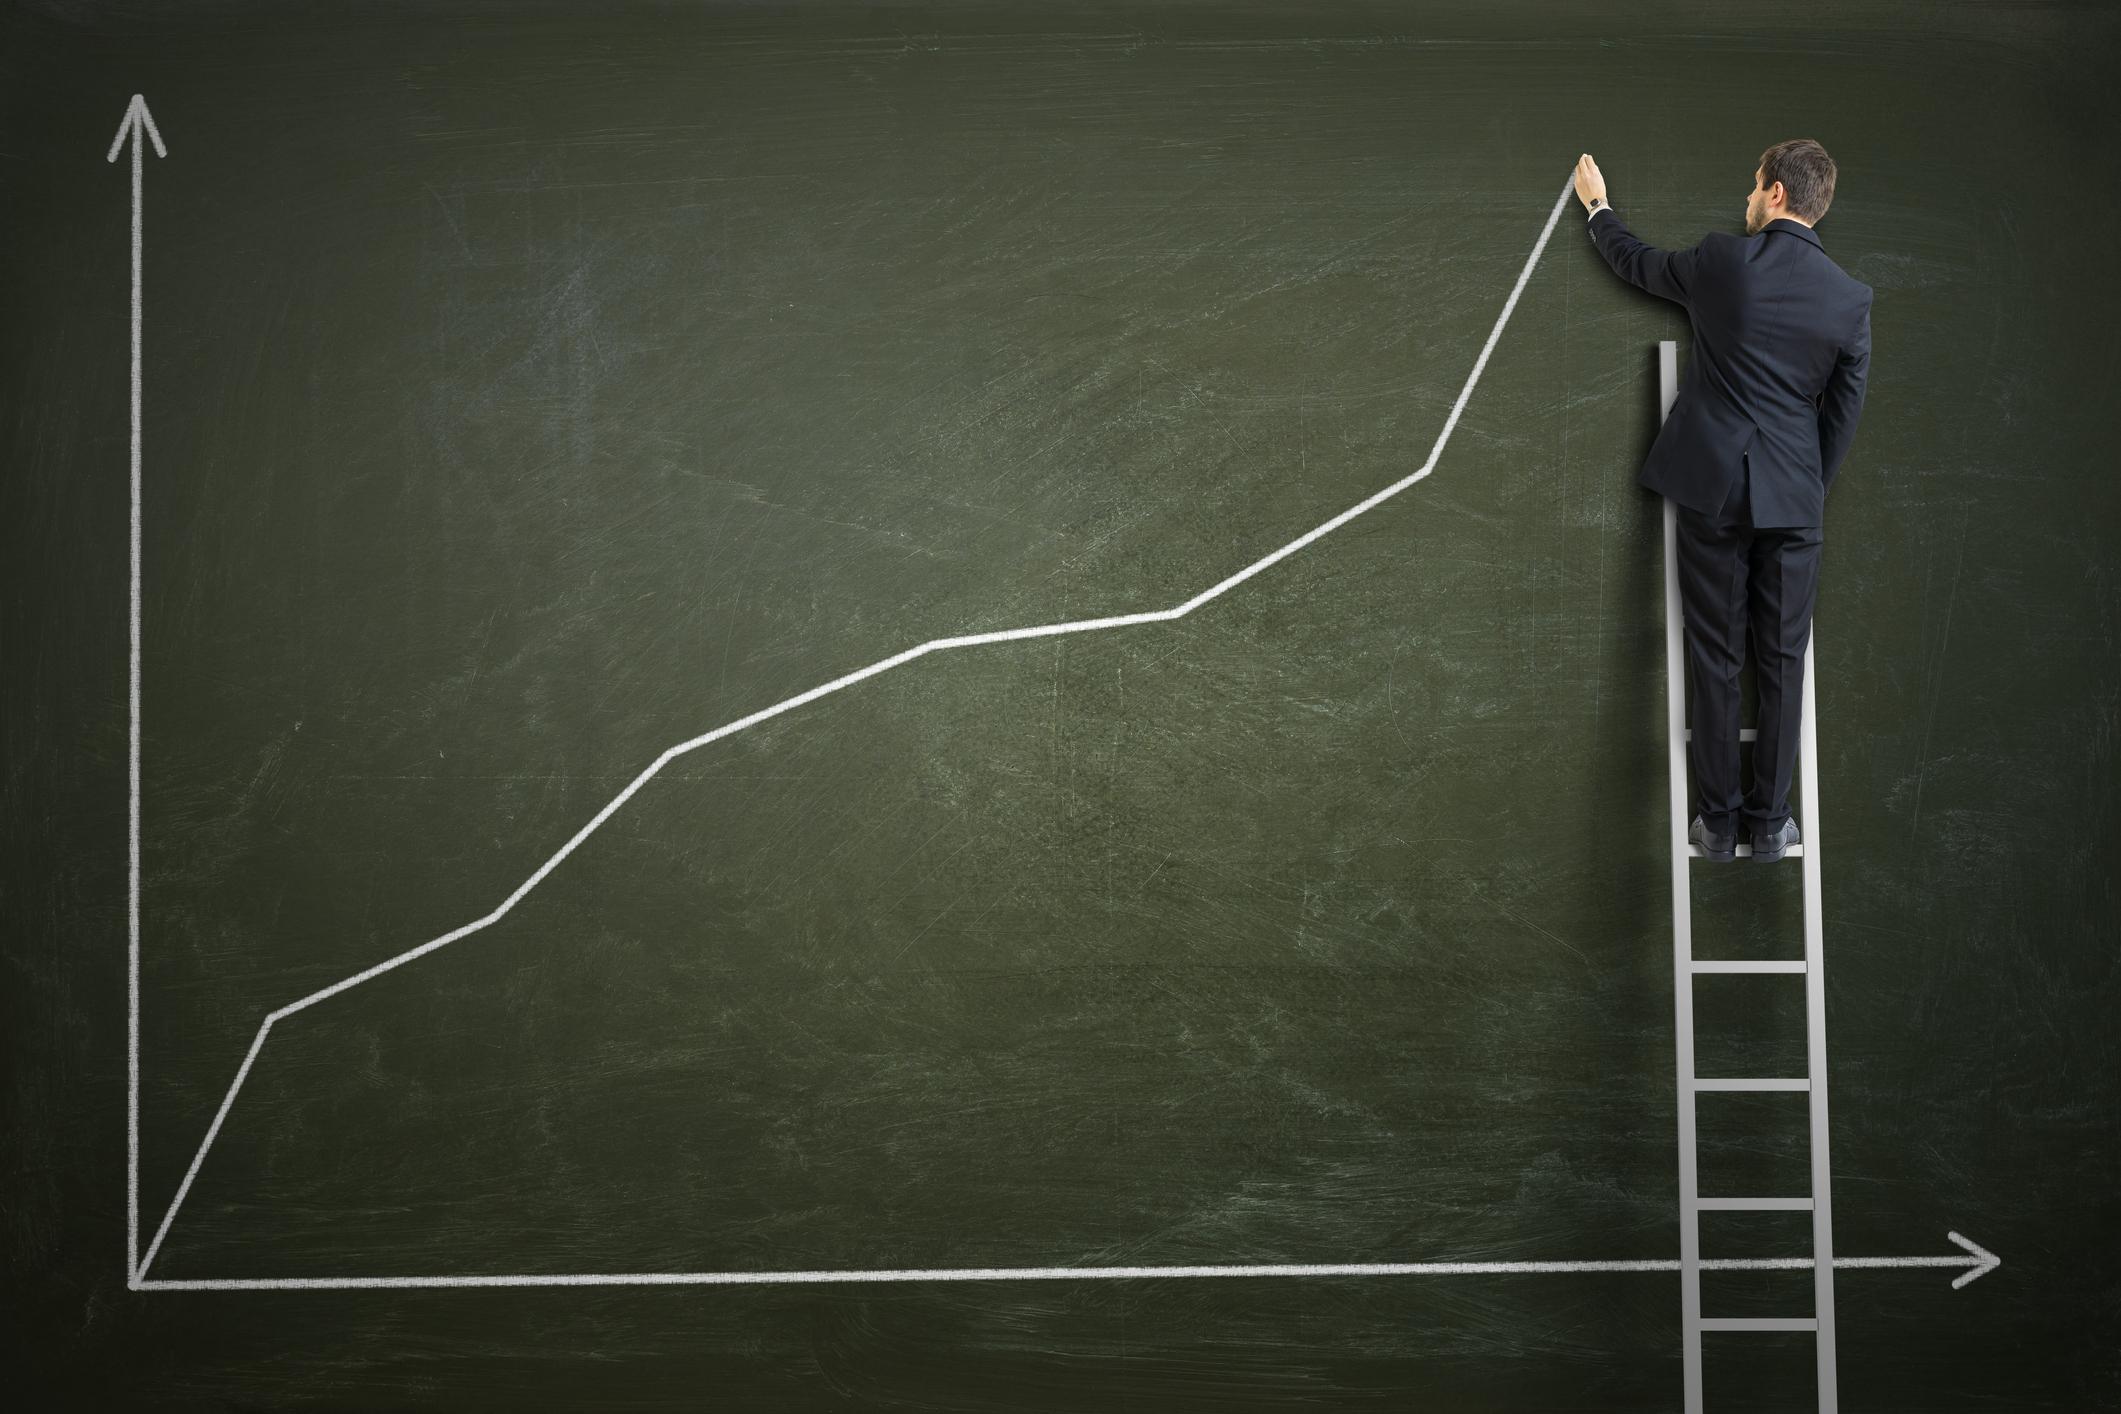 A businessman draws a rising stock chart on a large blackboard.